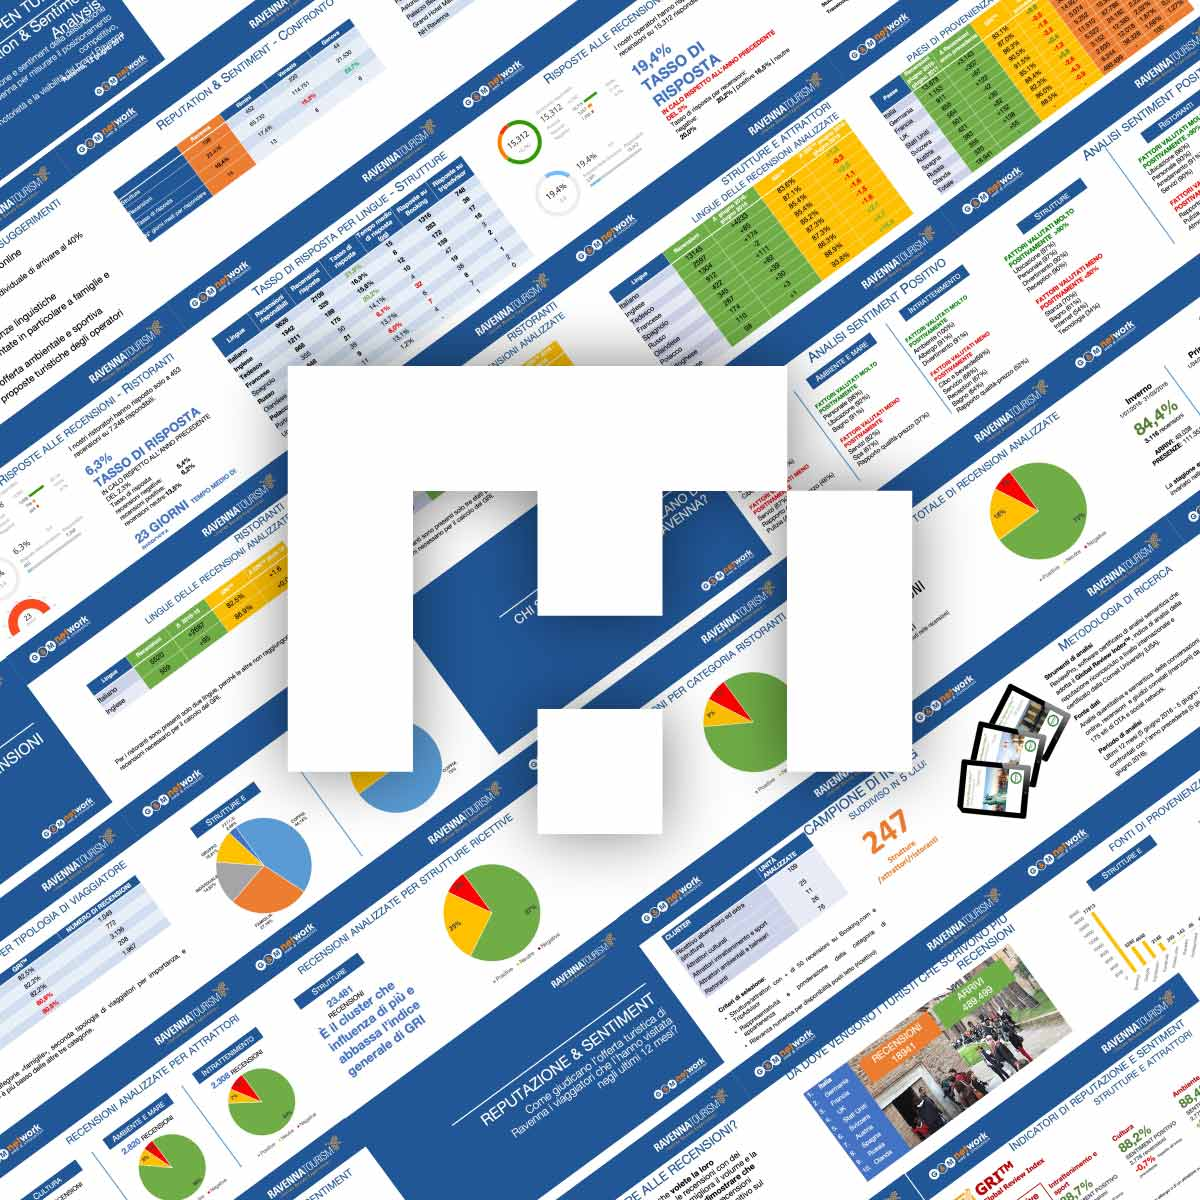 comune-di-ravenna-marketing-turismo-research&analysis